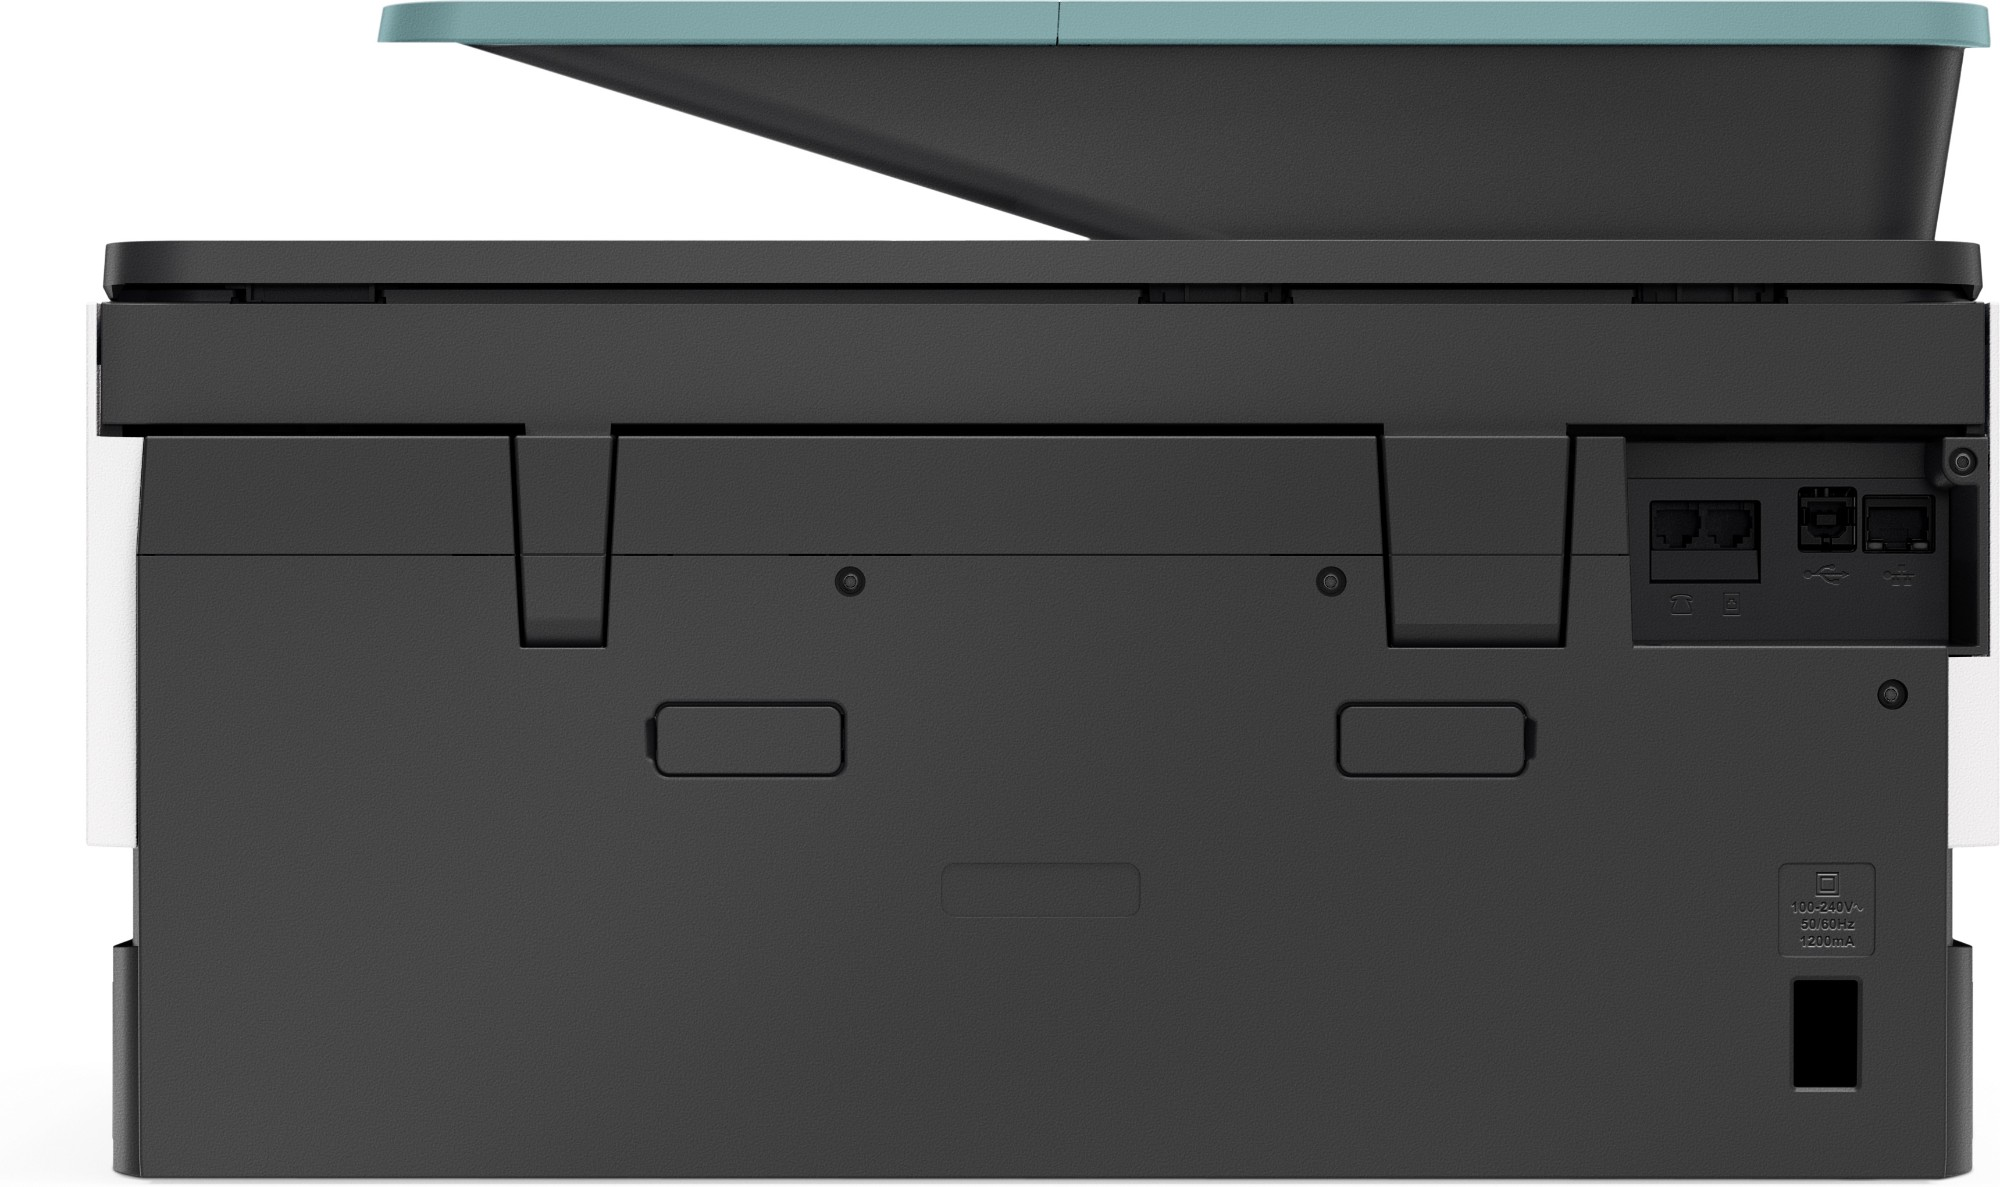 Hp Officejet Pro 9015 Thermal Inkjet 4800 X 1200 Dpi 22 Manual Guide